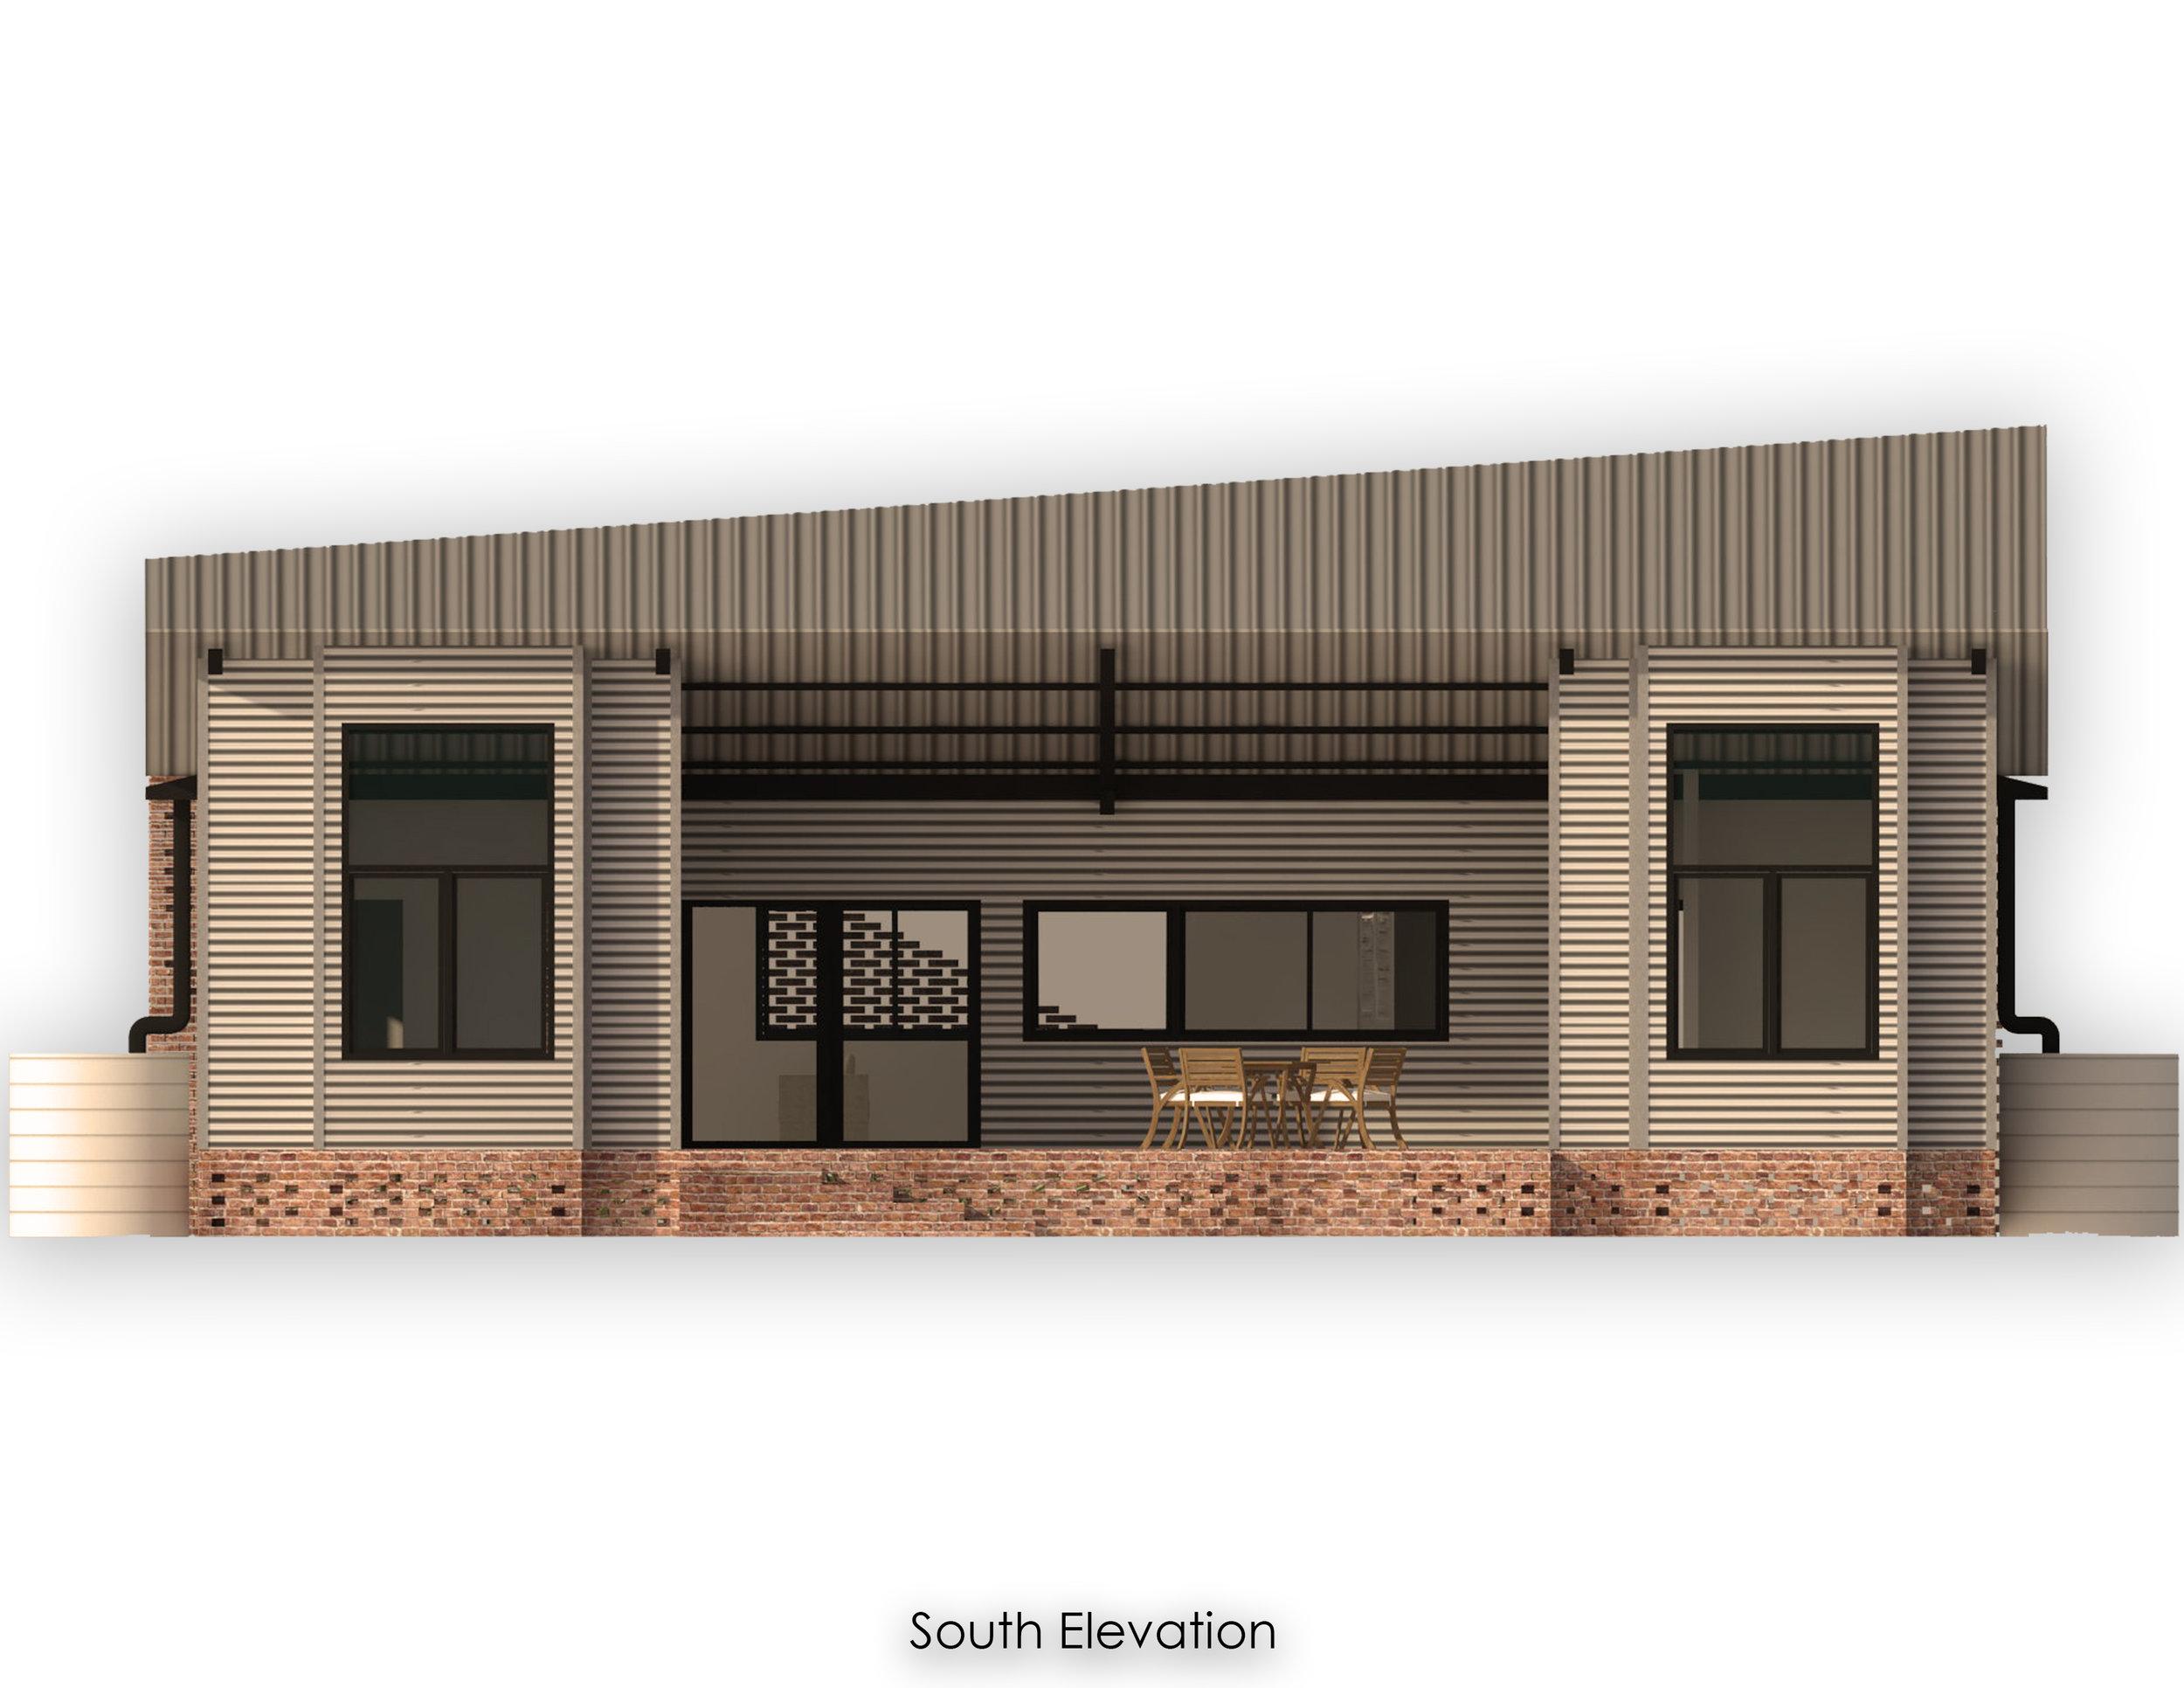 5_South_Elevation.jpg